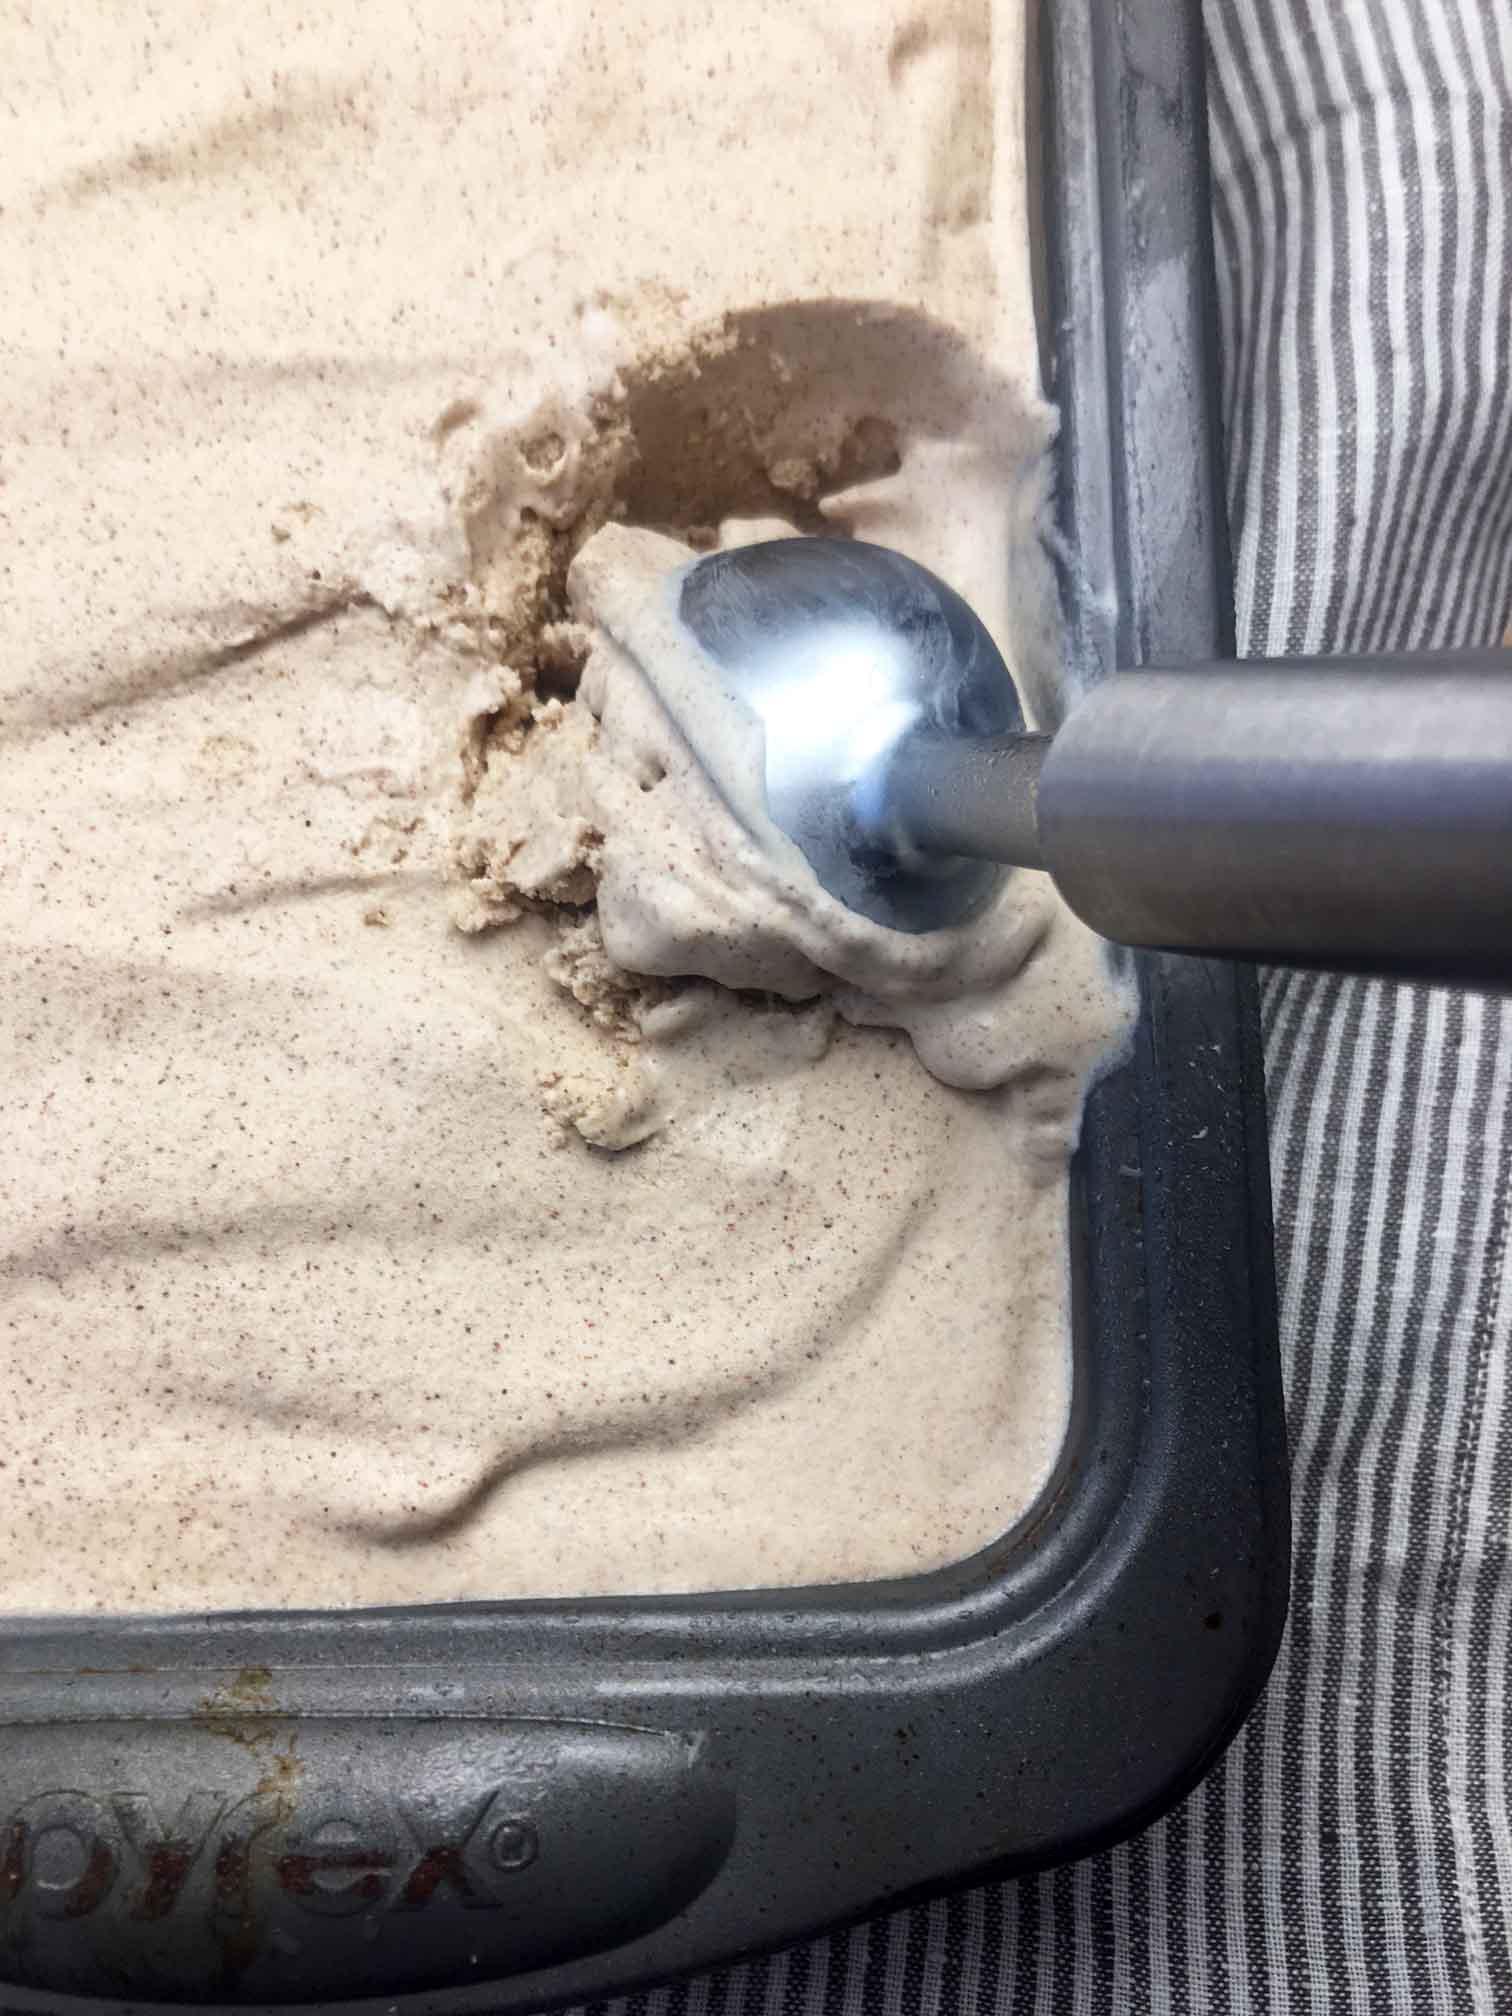 Low Carb Keto Cinnamon Brown Sugar Ice Cream Recipe